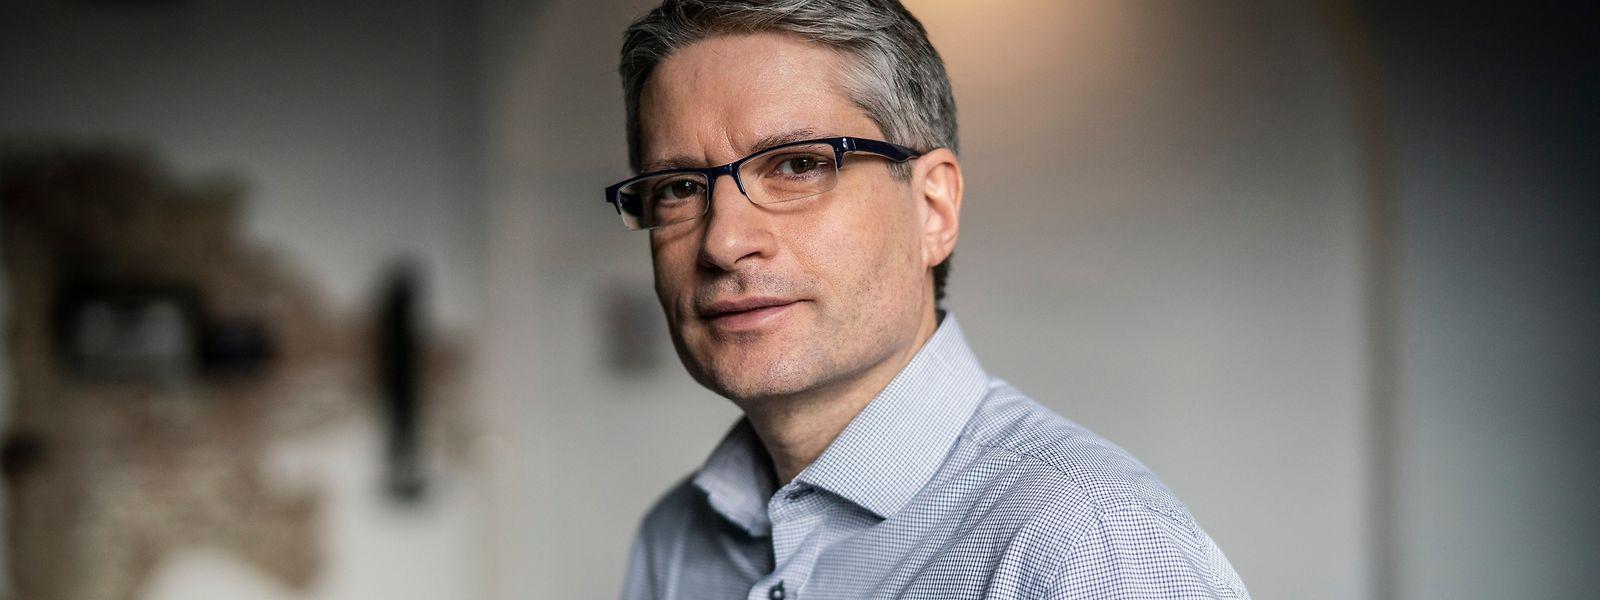 Der Europaabgeordnete Sven Giegold fordert einen härteren Kampf gegen Steuervermeidung.